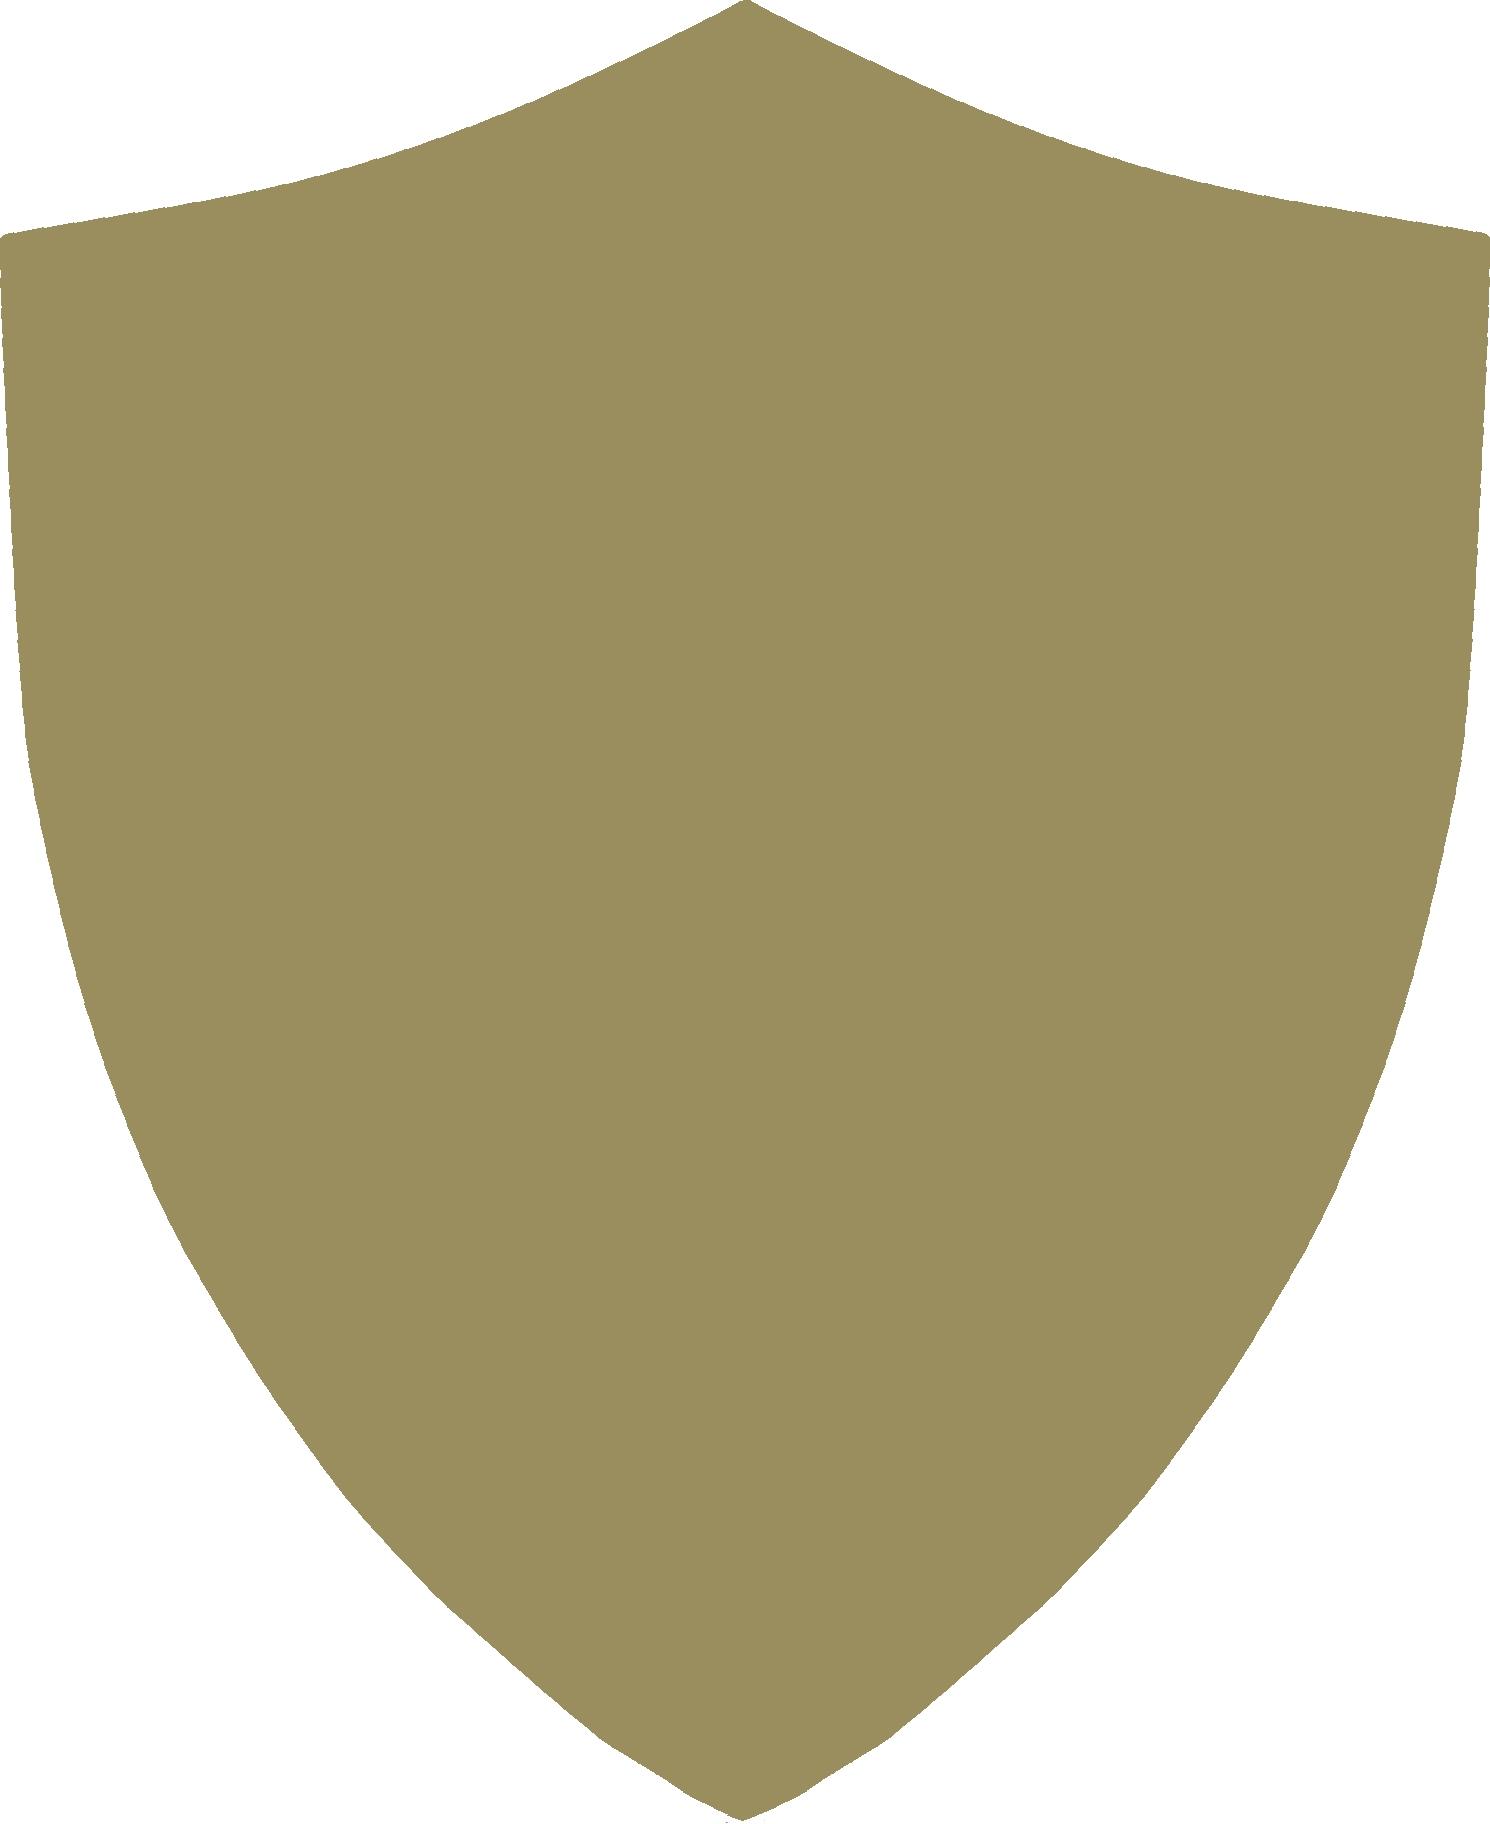 1490x1824 Police Shield Clipart